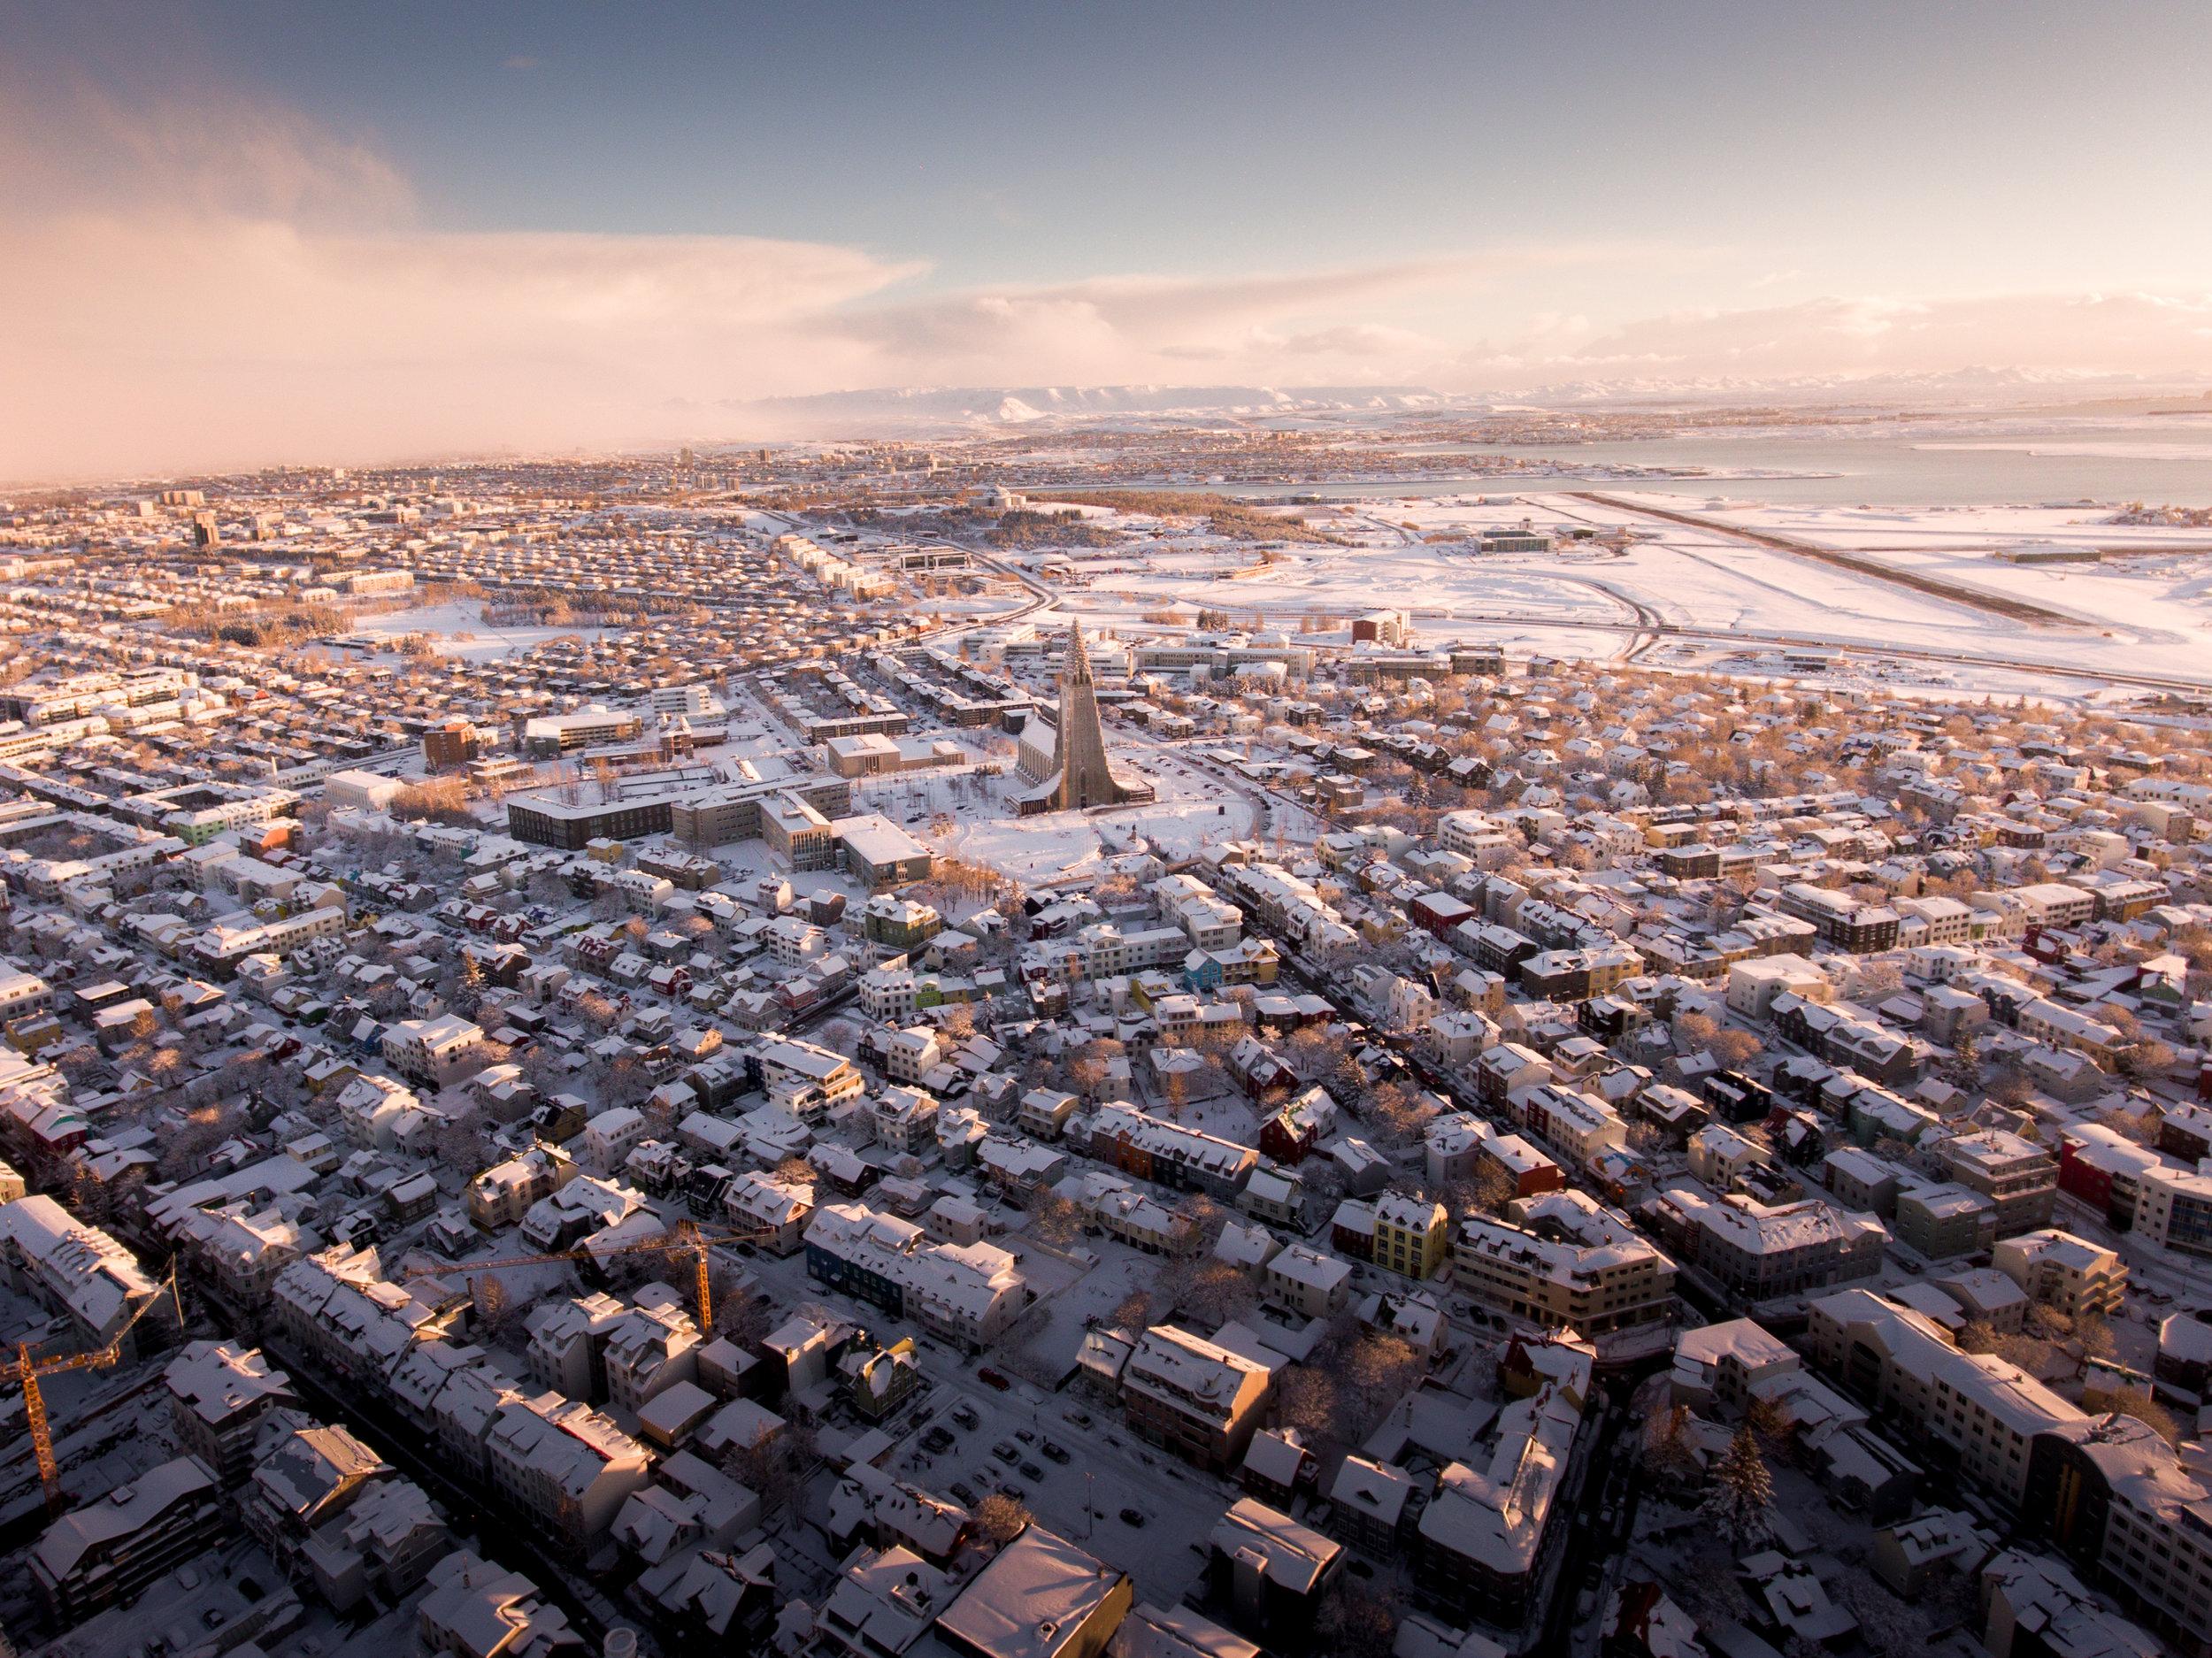 jermiah-schuster-iceland-476.jpg